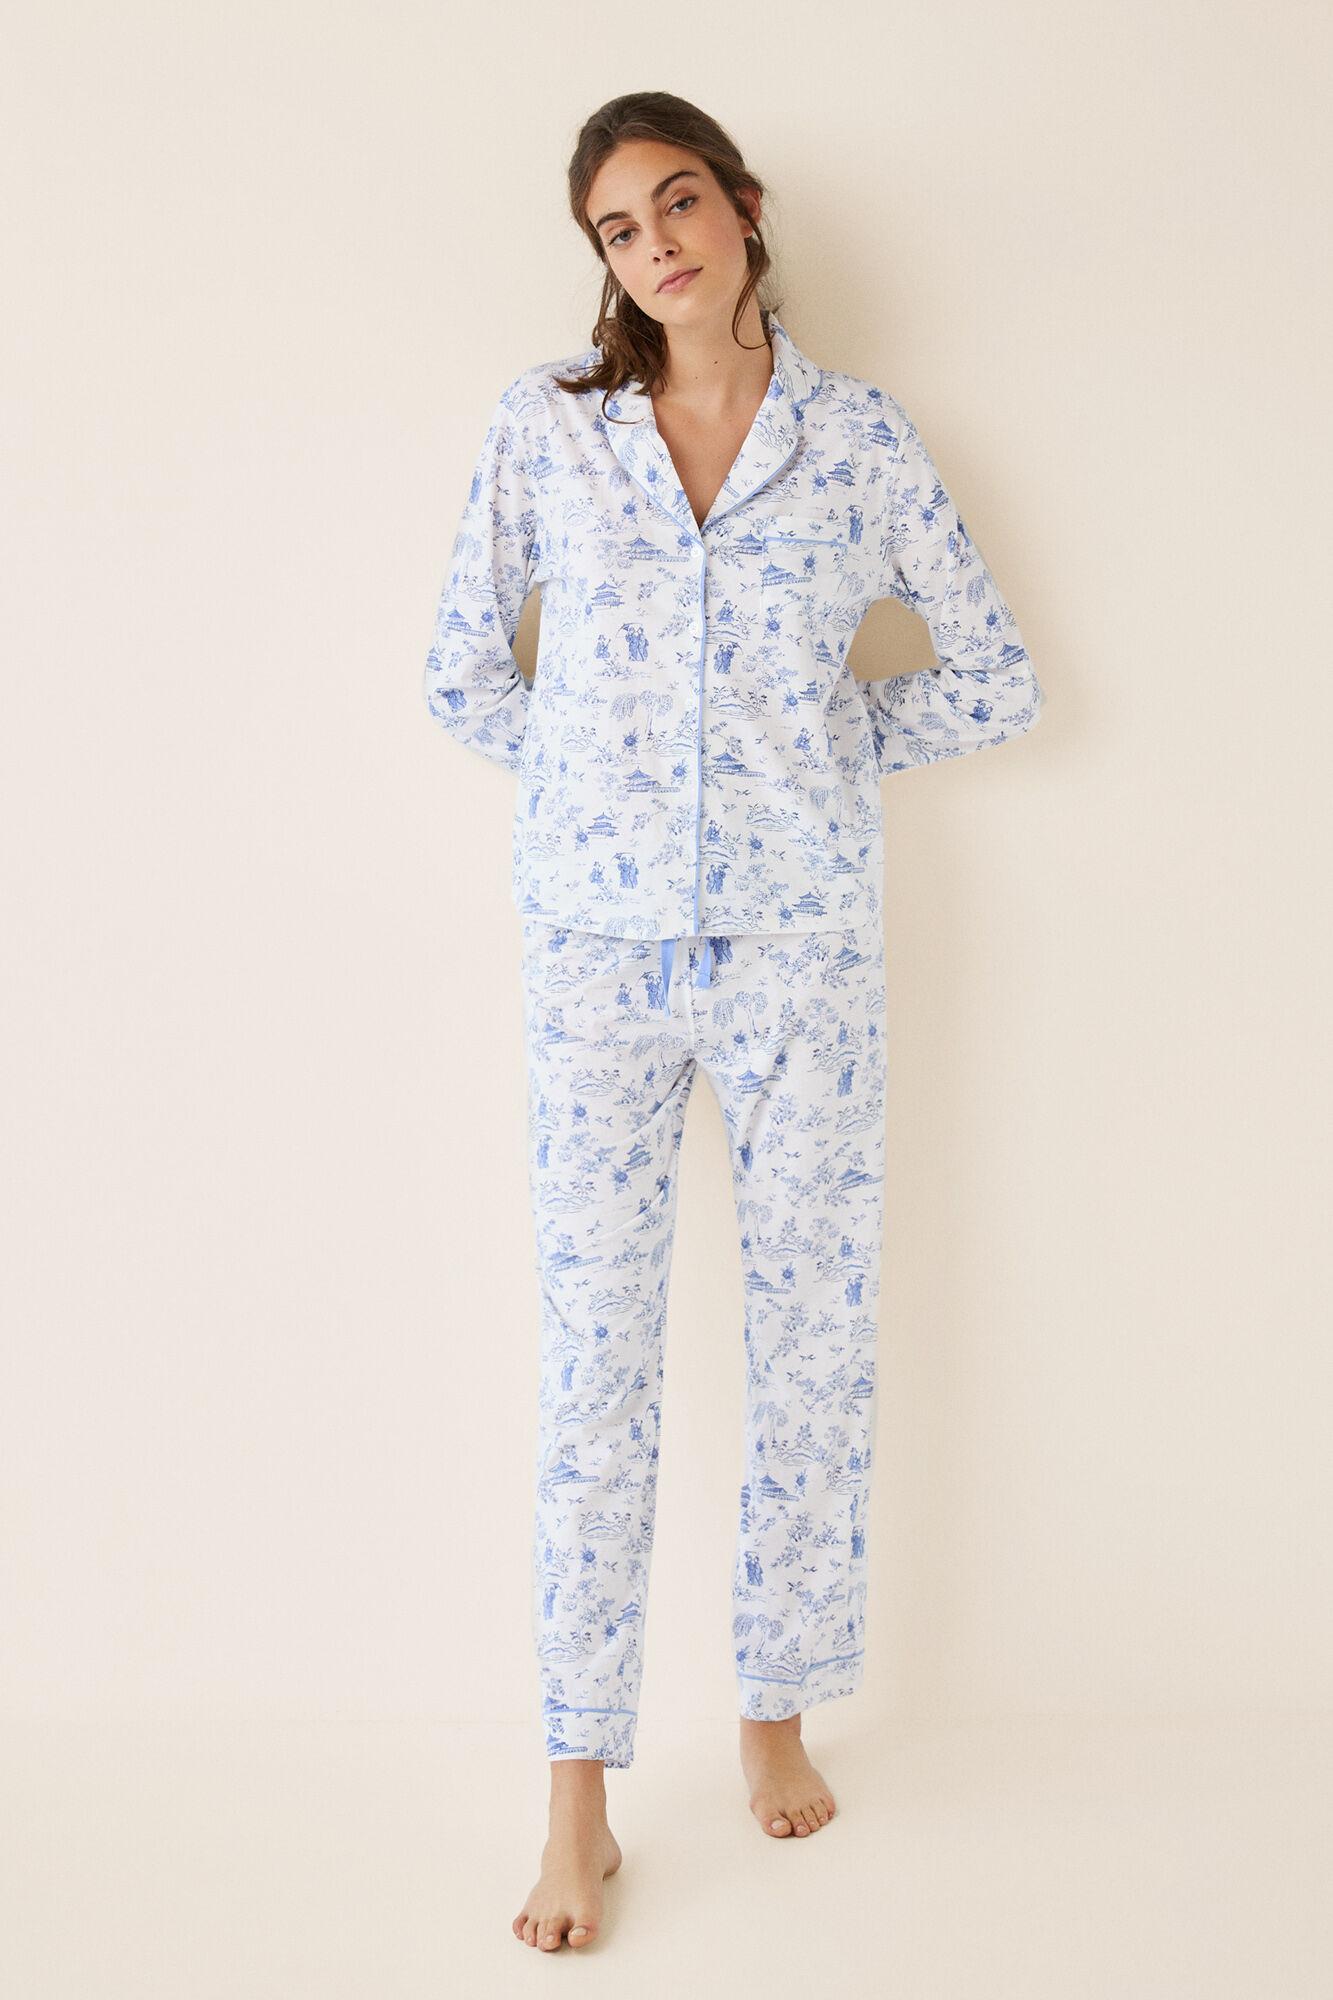 3a18aa5fe3 Pijama camisero largo oriental